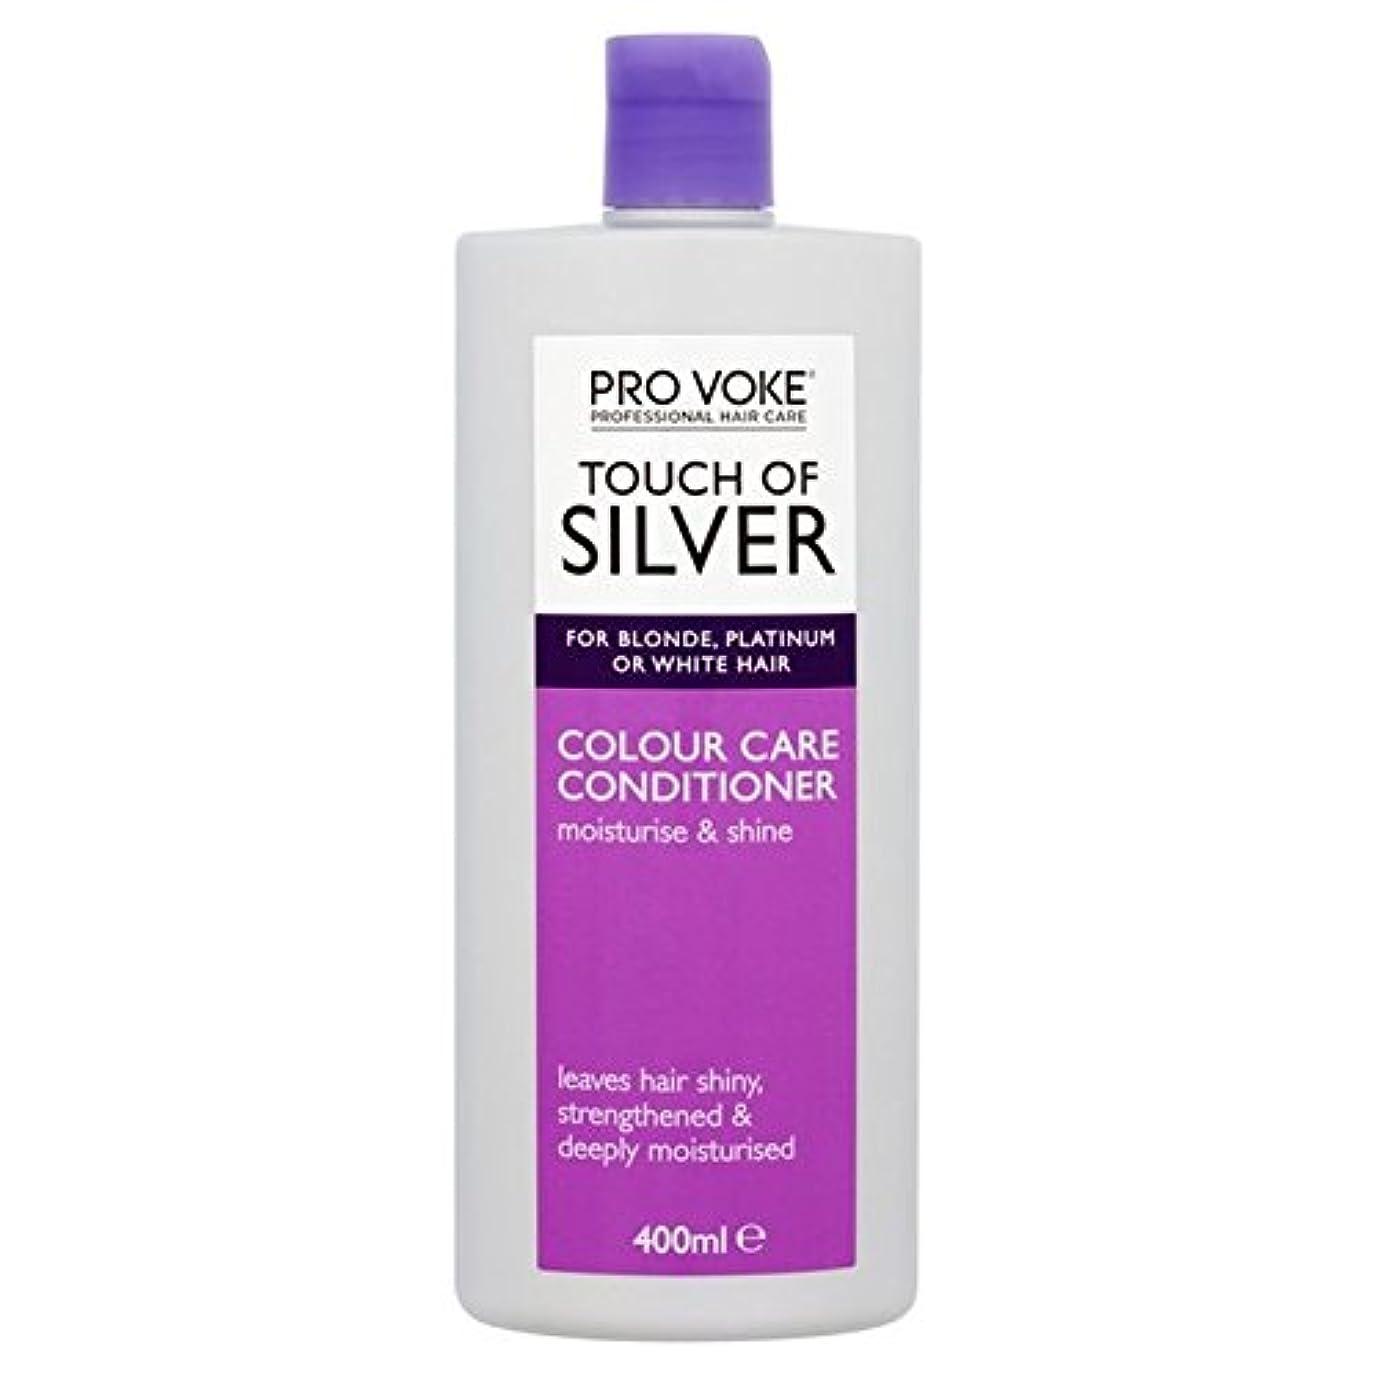 Touch of Silver Daily Nourish Conditioner 400ml (Pack of 6) - 銀毎日ナリッシュコンディショナー400ミリリットルのタッチ x6 [並行輸入品]